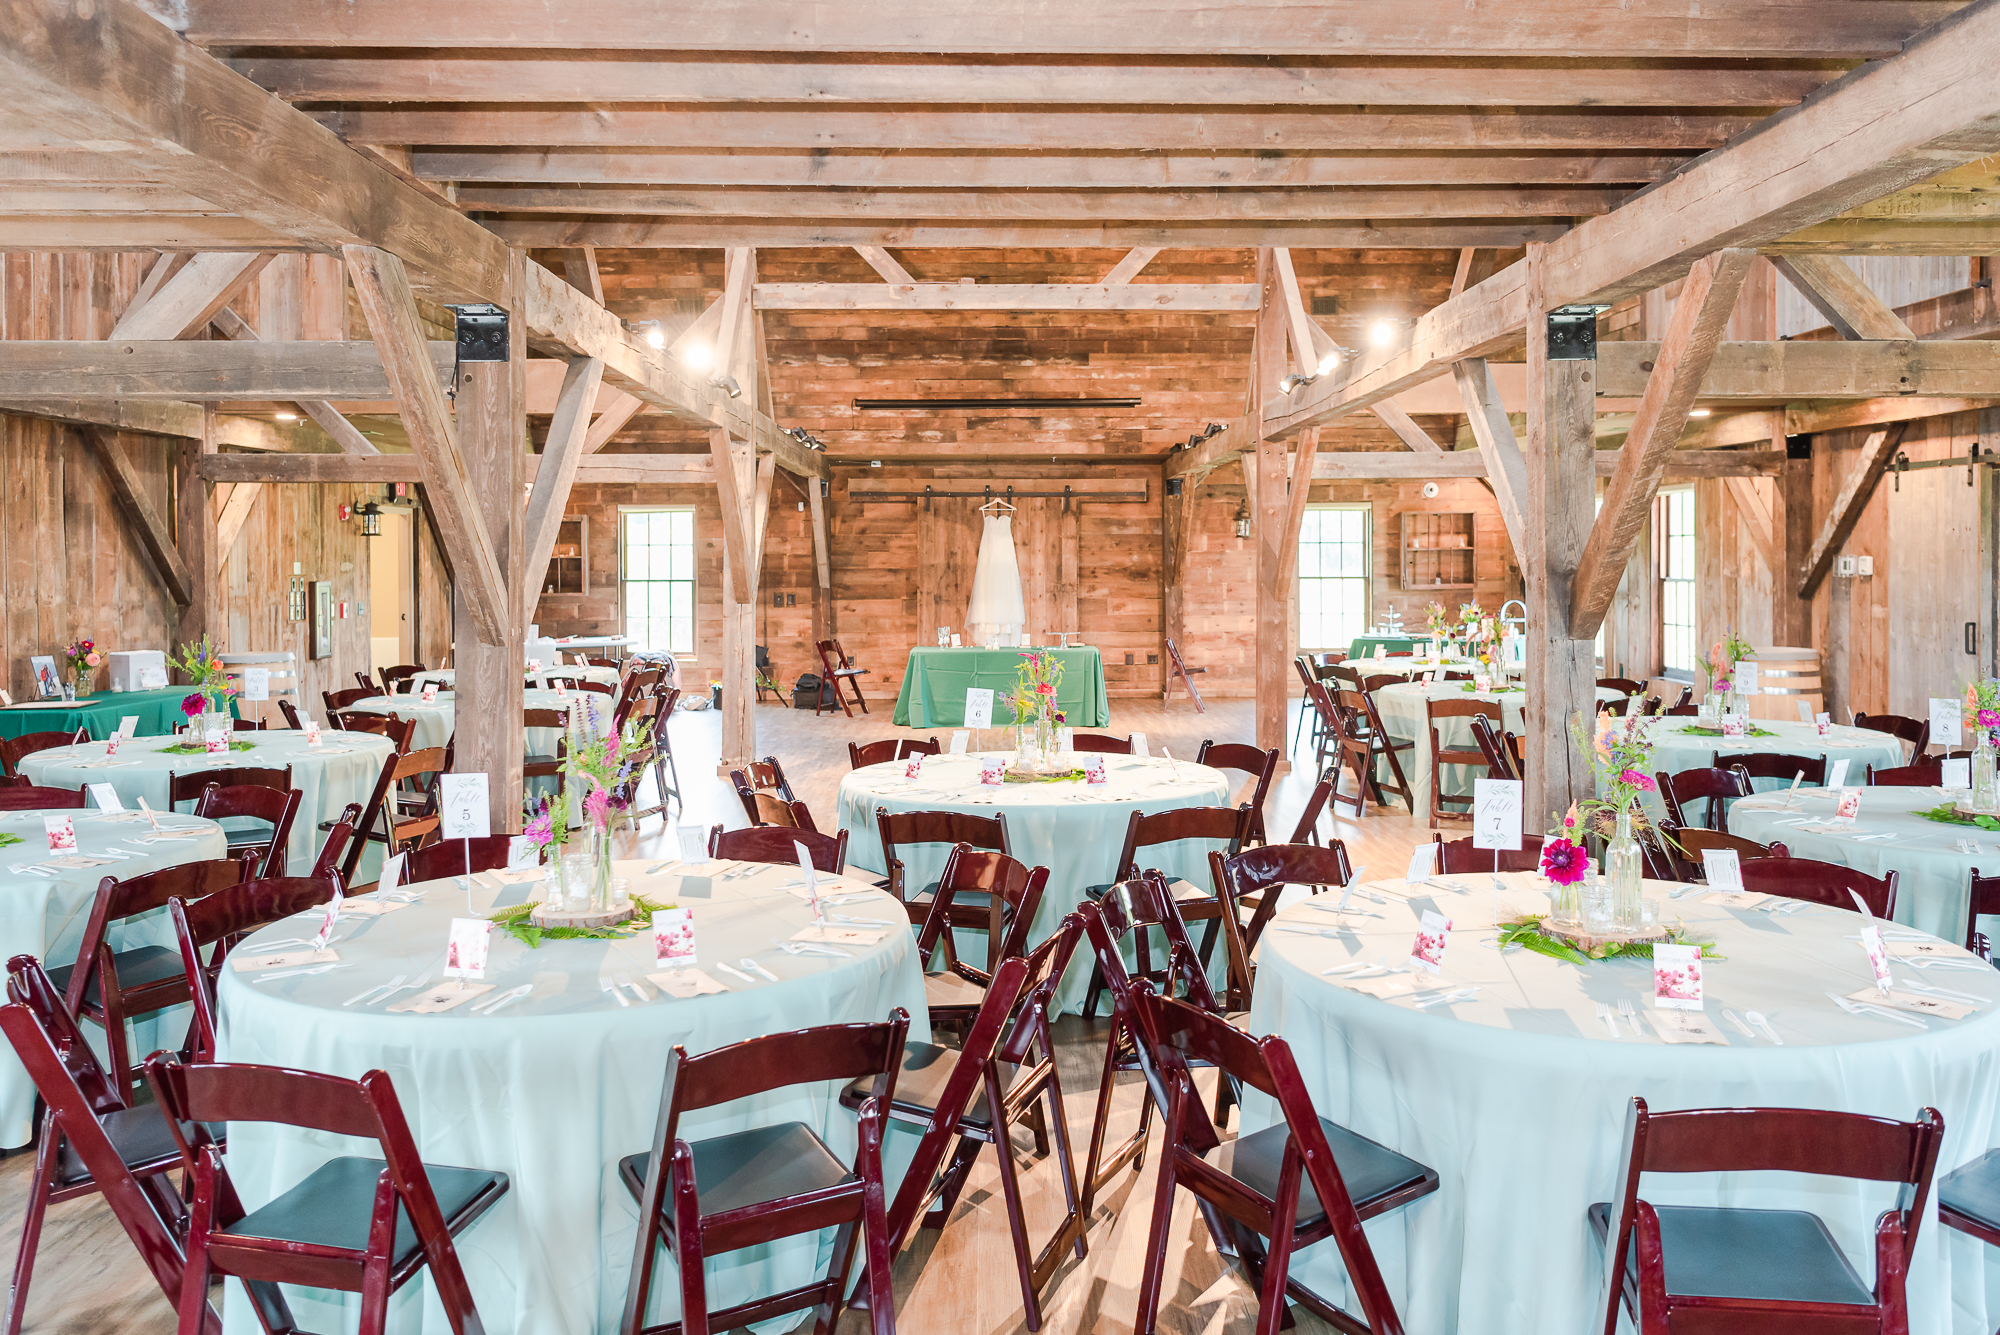 Maria+Adam_Summer Barn Wedding_The Barn at The North Star Preserve_Oberlin_Ohio-9.jpg